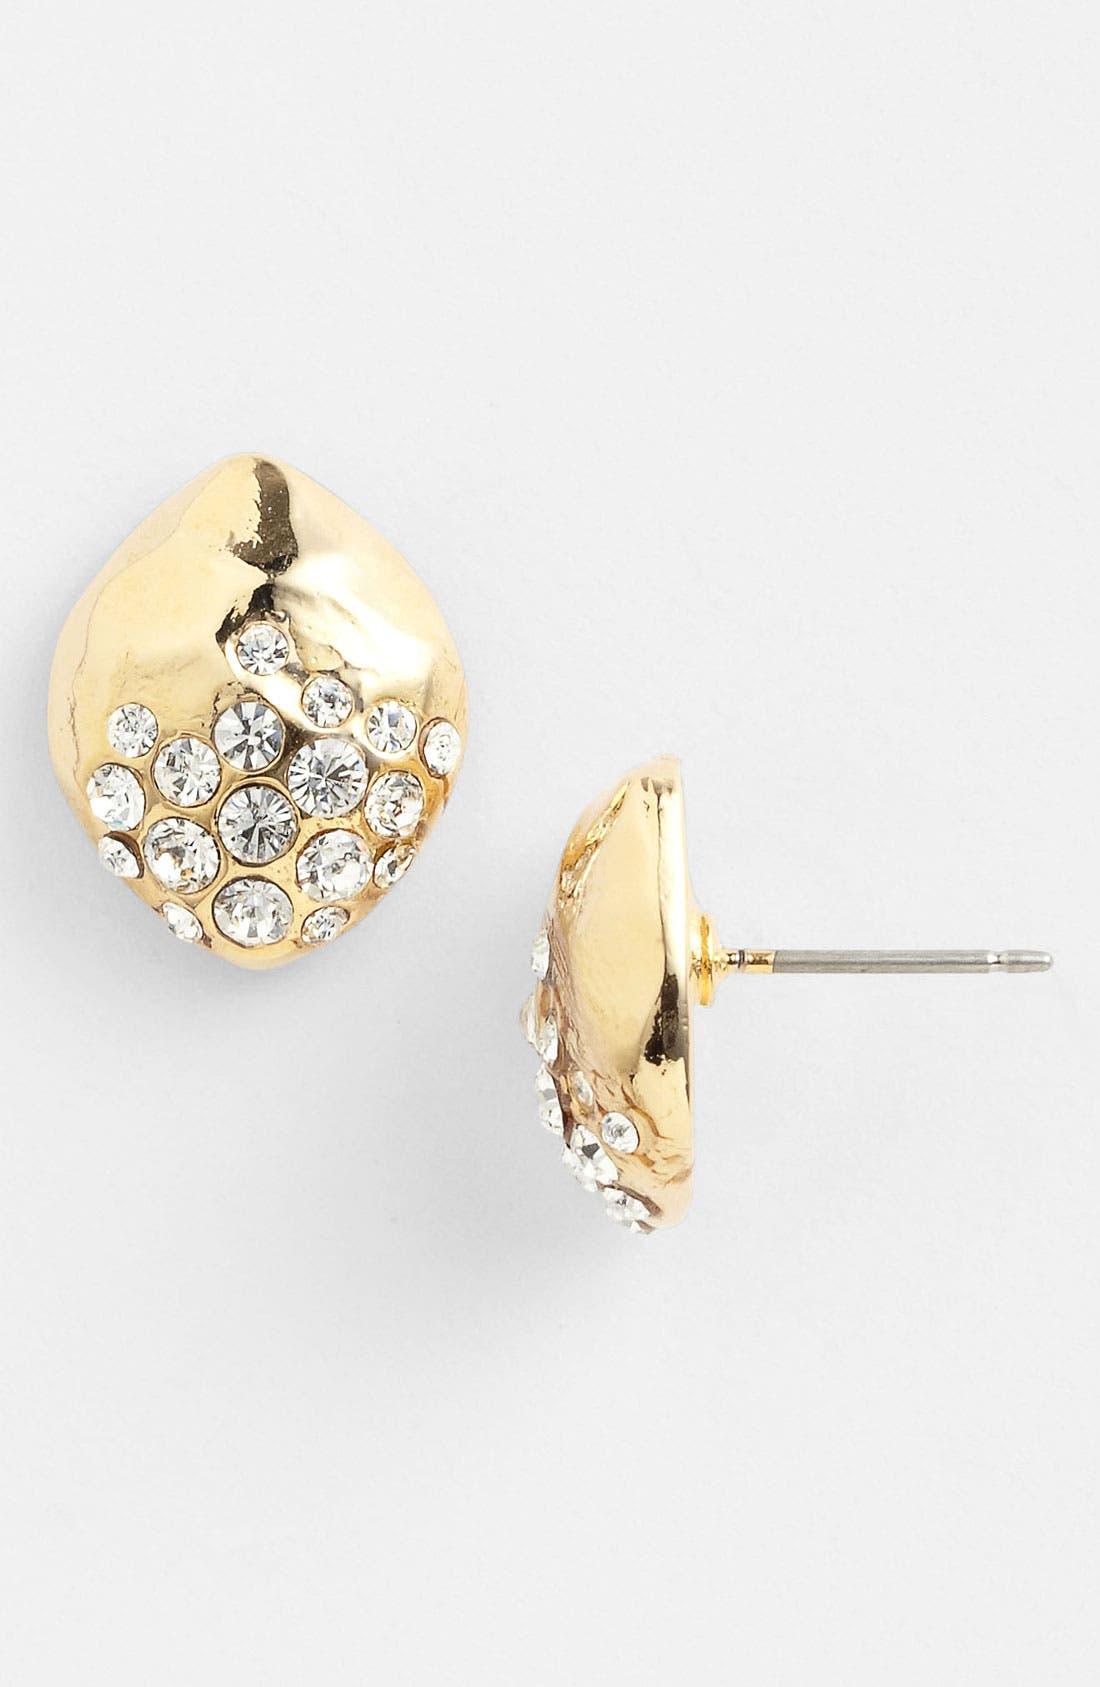 Alternate Image 1 Selected - Nordstrom 'Sand Dollar' Stud Earrings